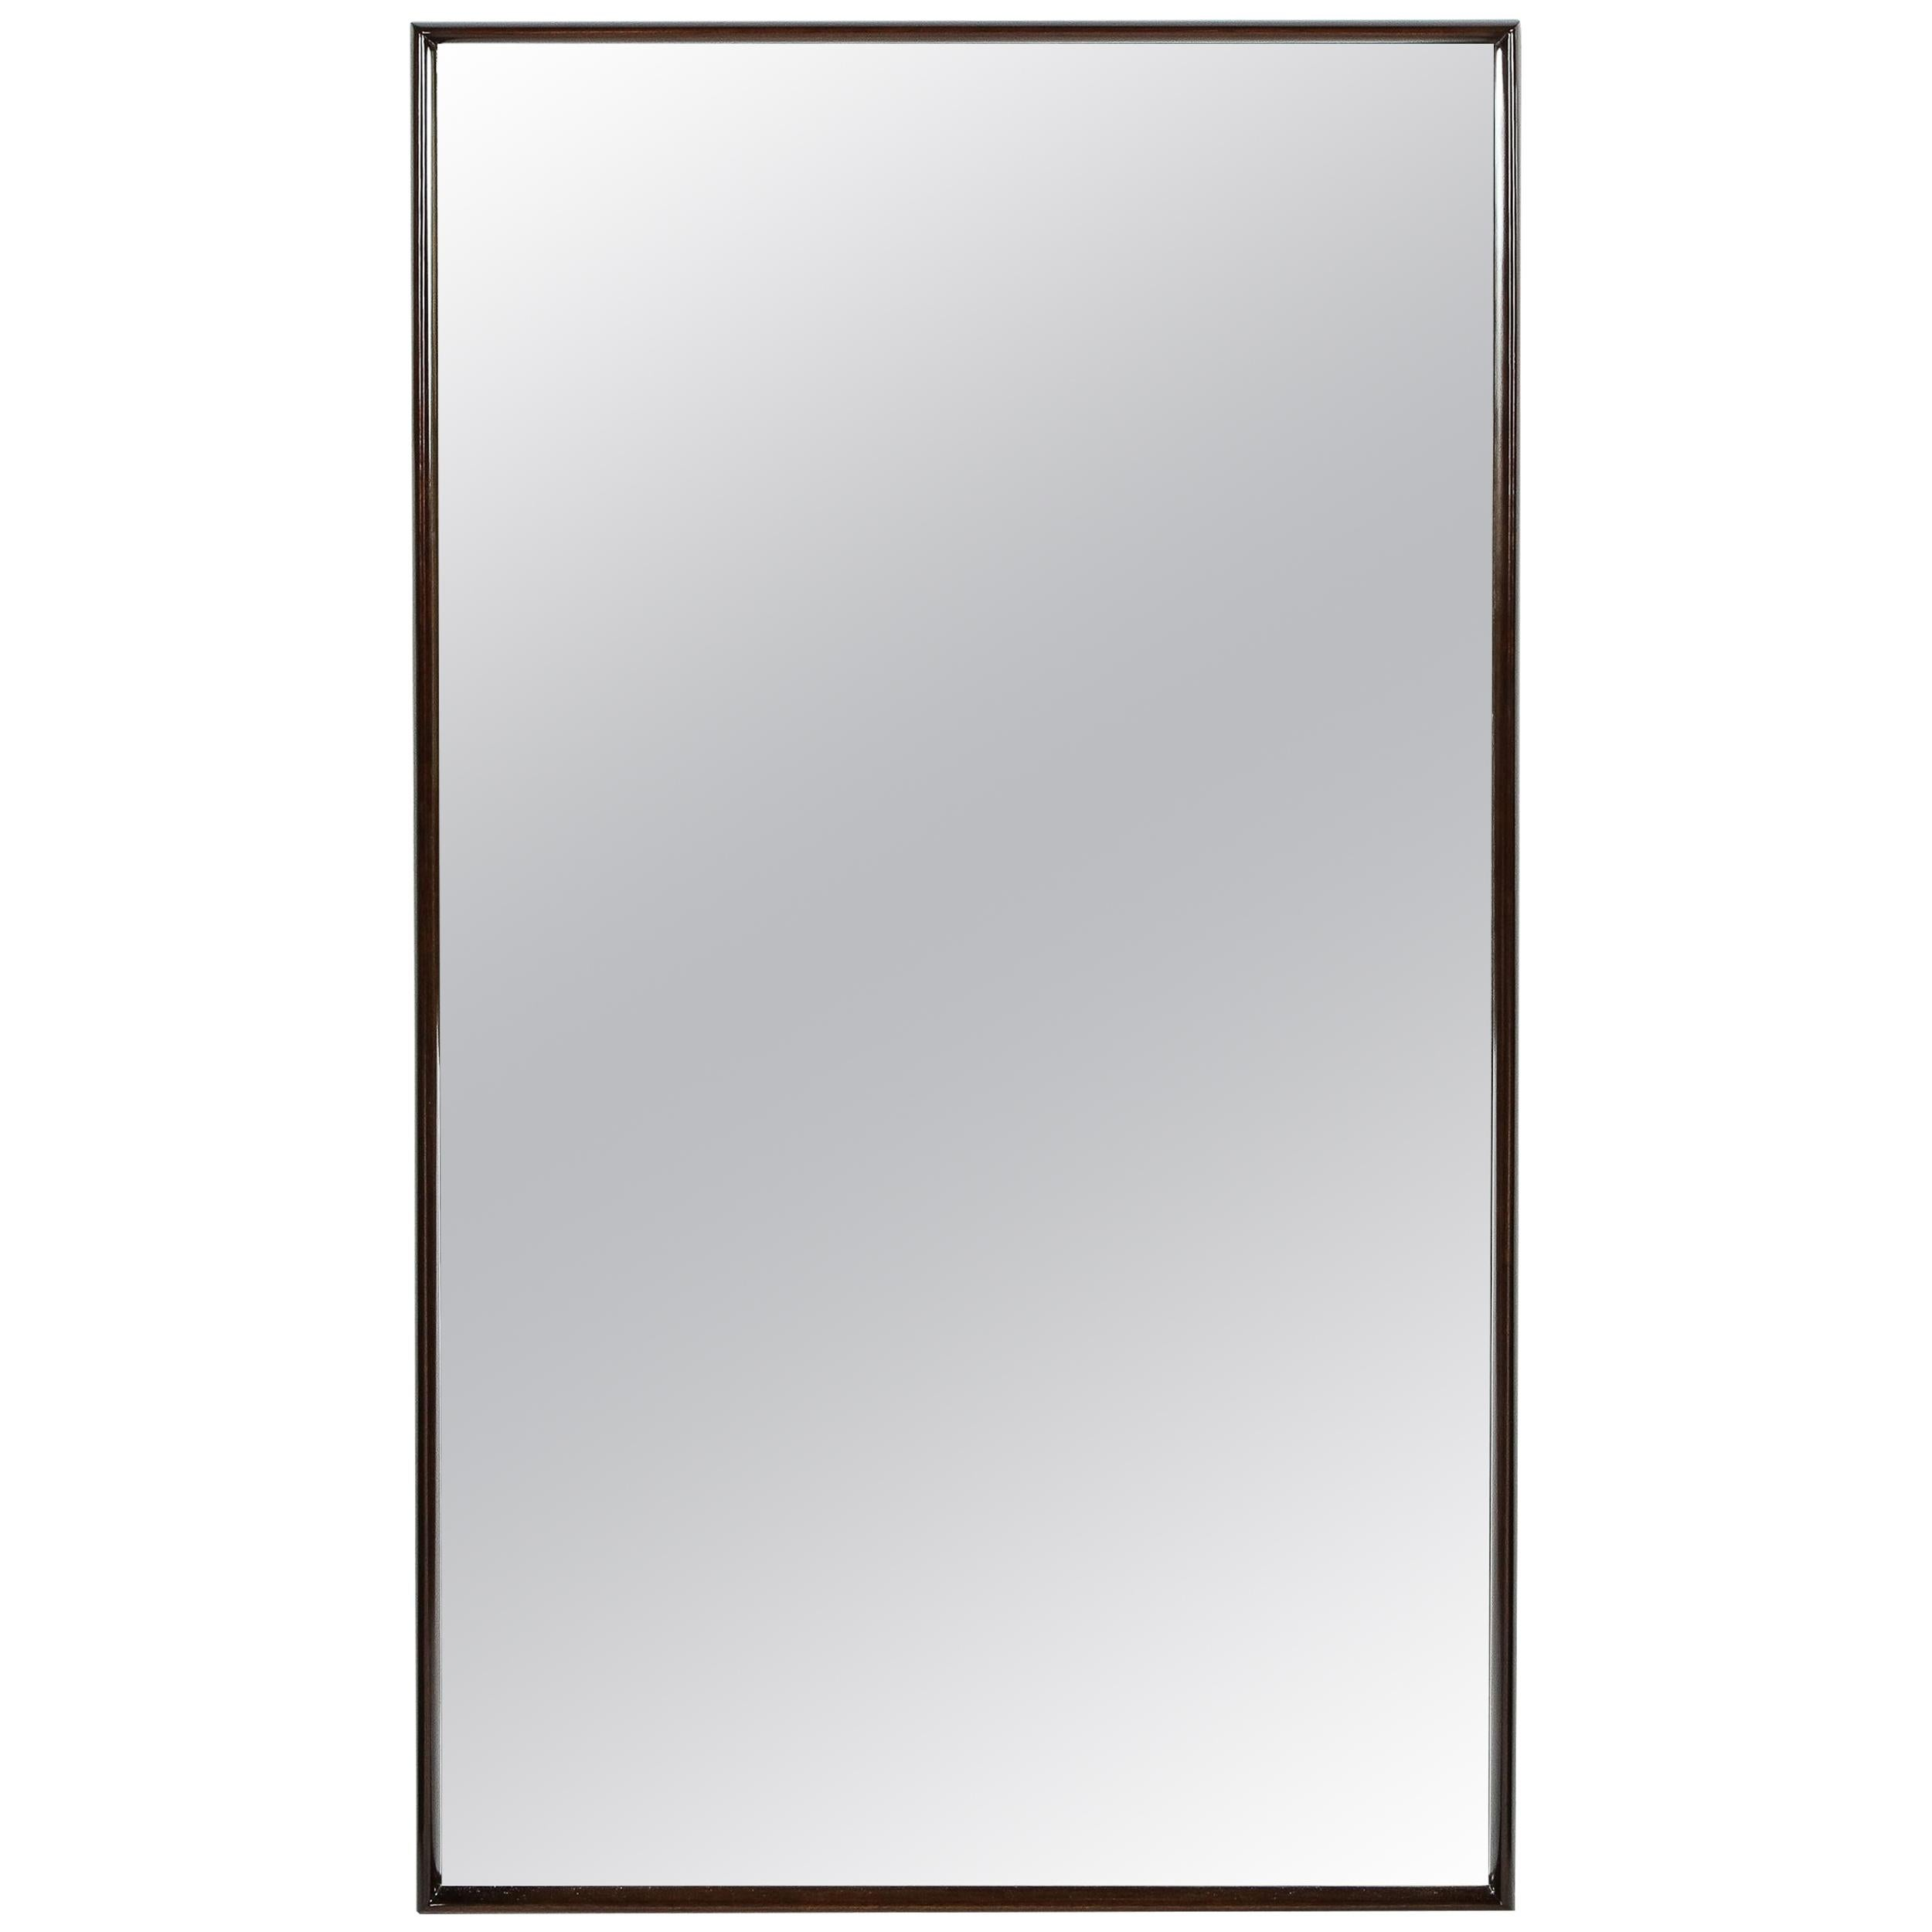 Midcentury Handrubbed Walnut Mirror by T.H. Robsjohn-Gibbings for Widdicomb Co.